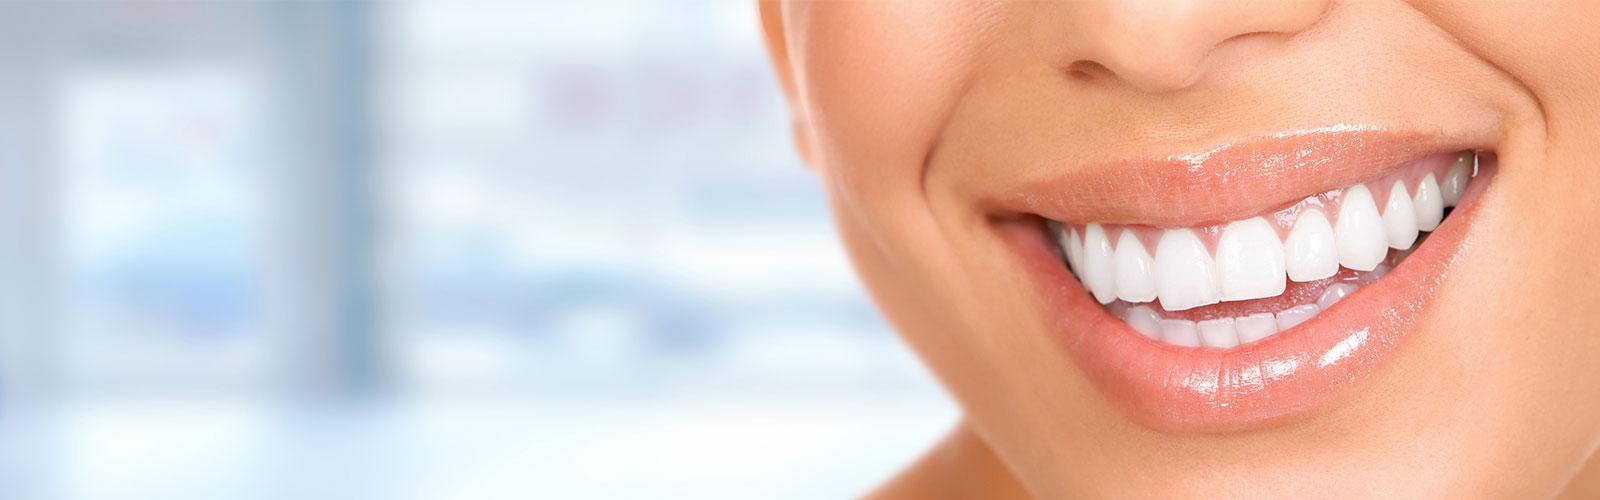 Zahnarztpraxis-Ciecior-Brühl-Zahnarzt-Vollkeramik-2